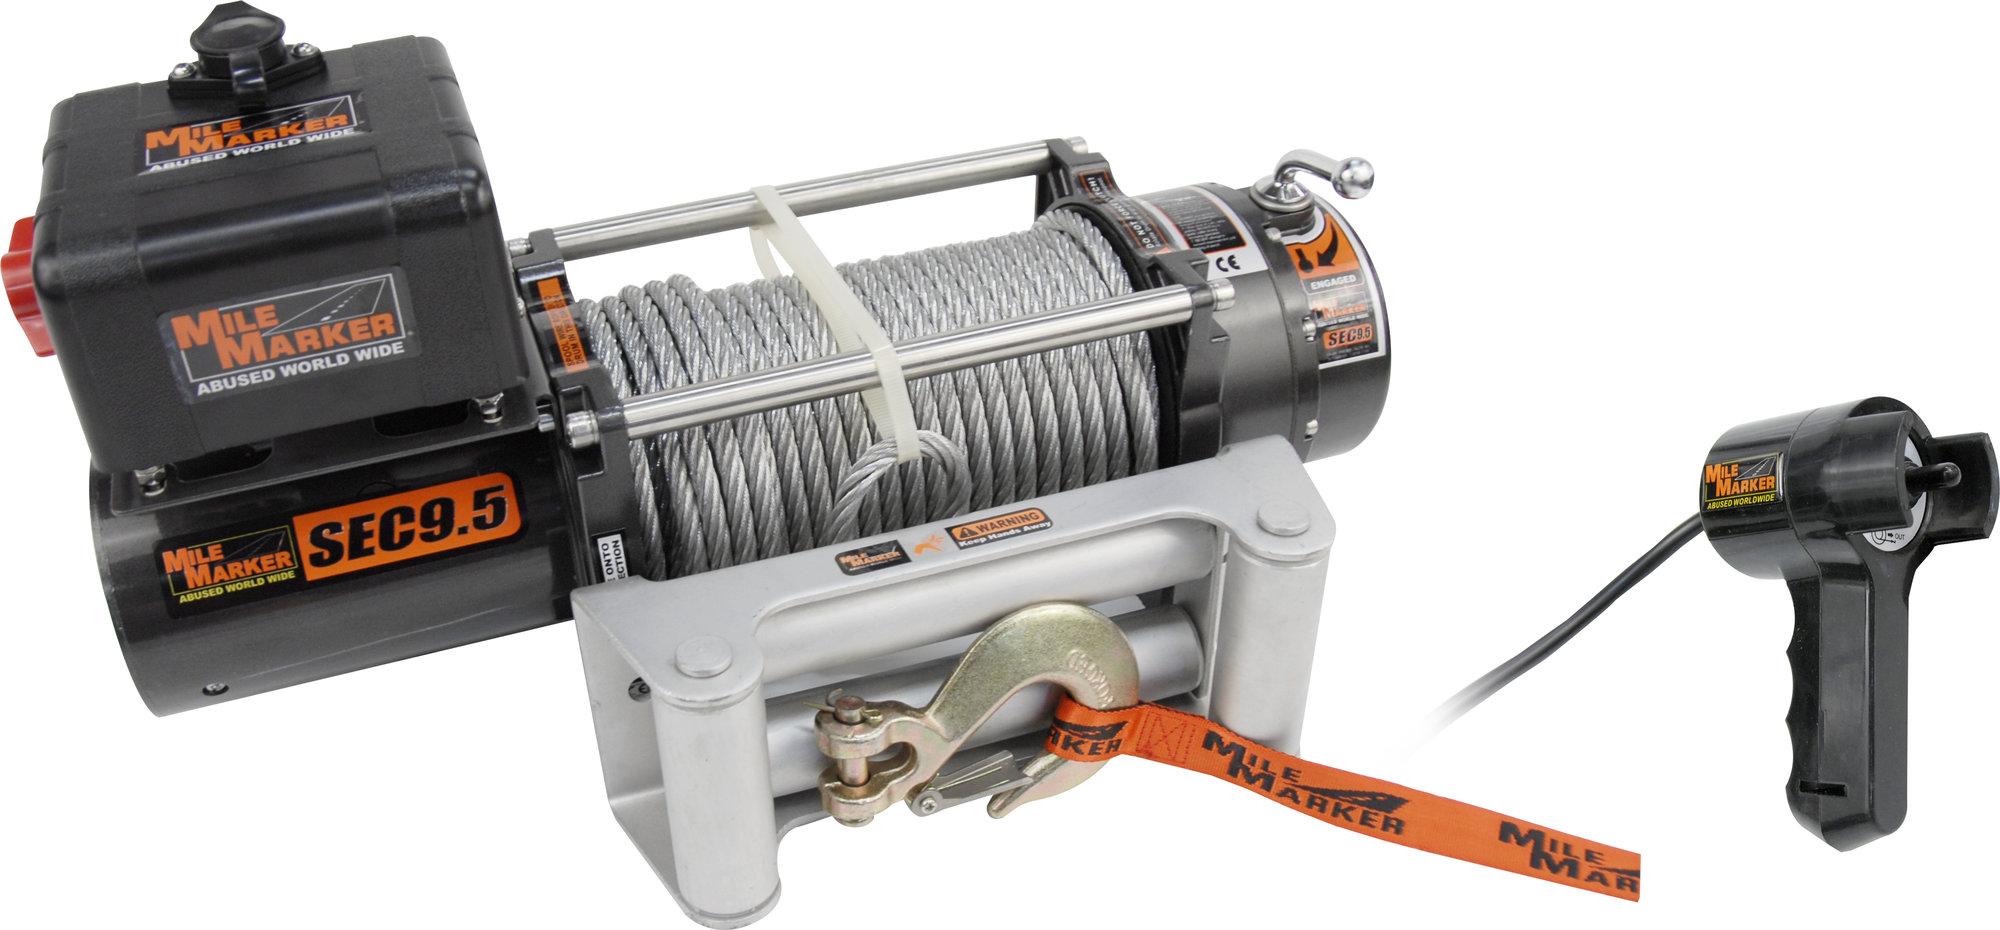 mile marker winch wiring diagram 7 way round trailer 76 50246b sec9 5 quadratec